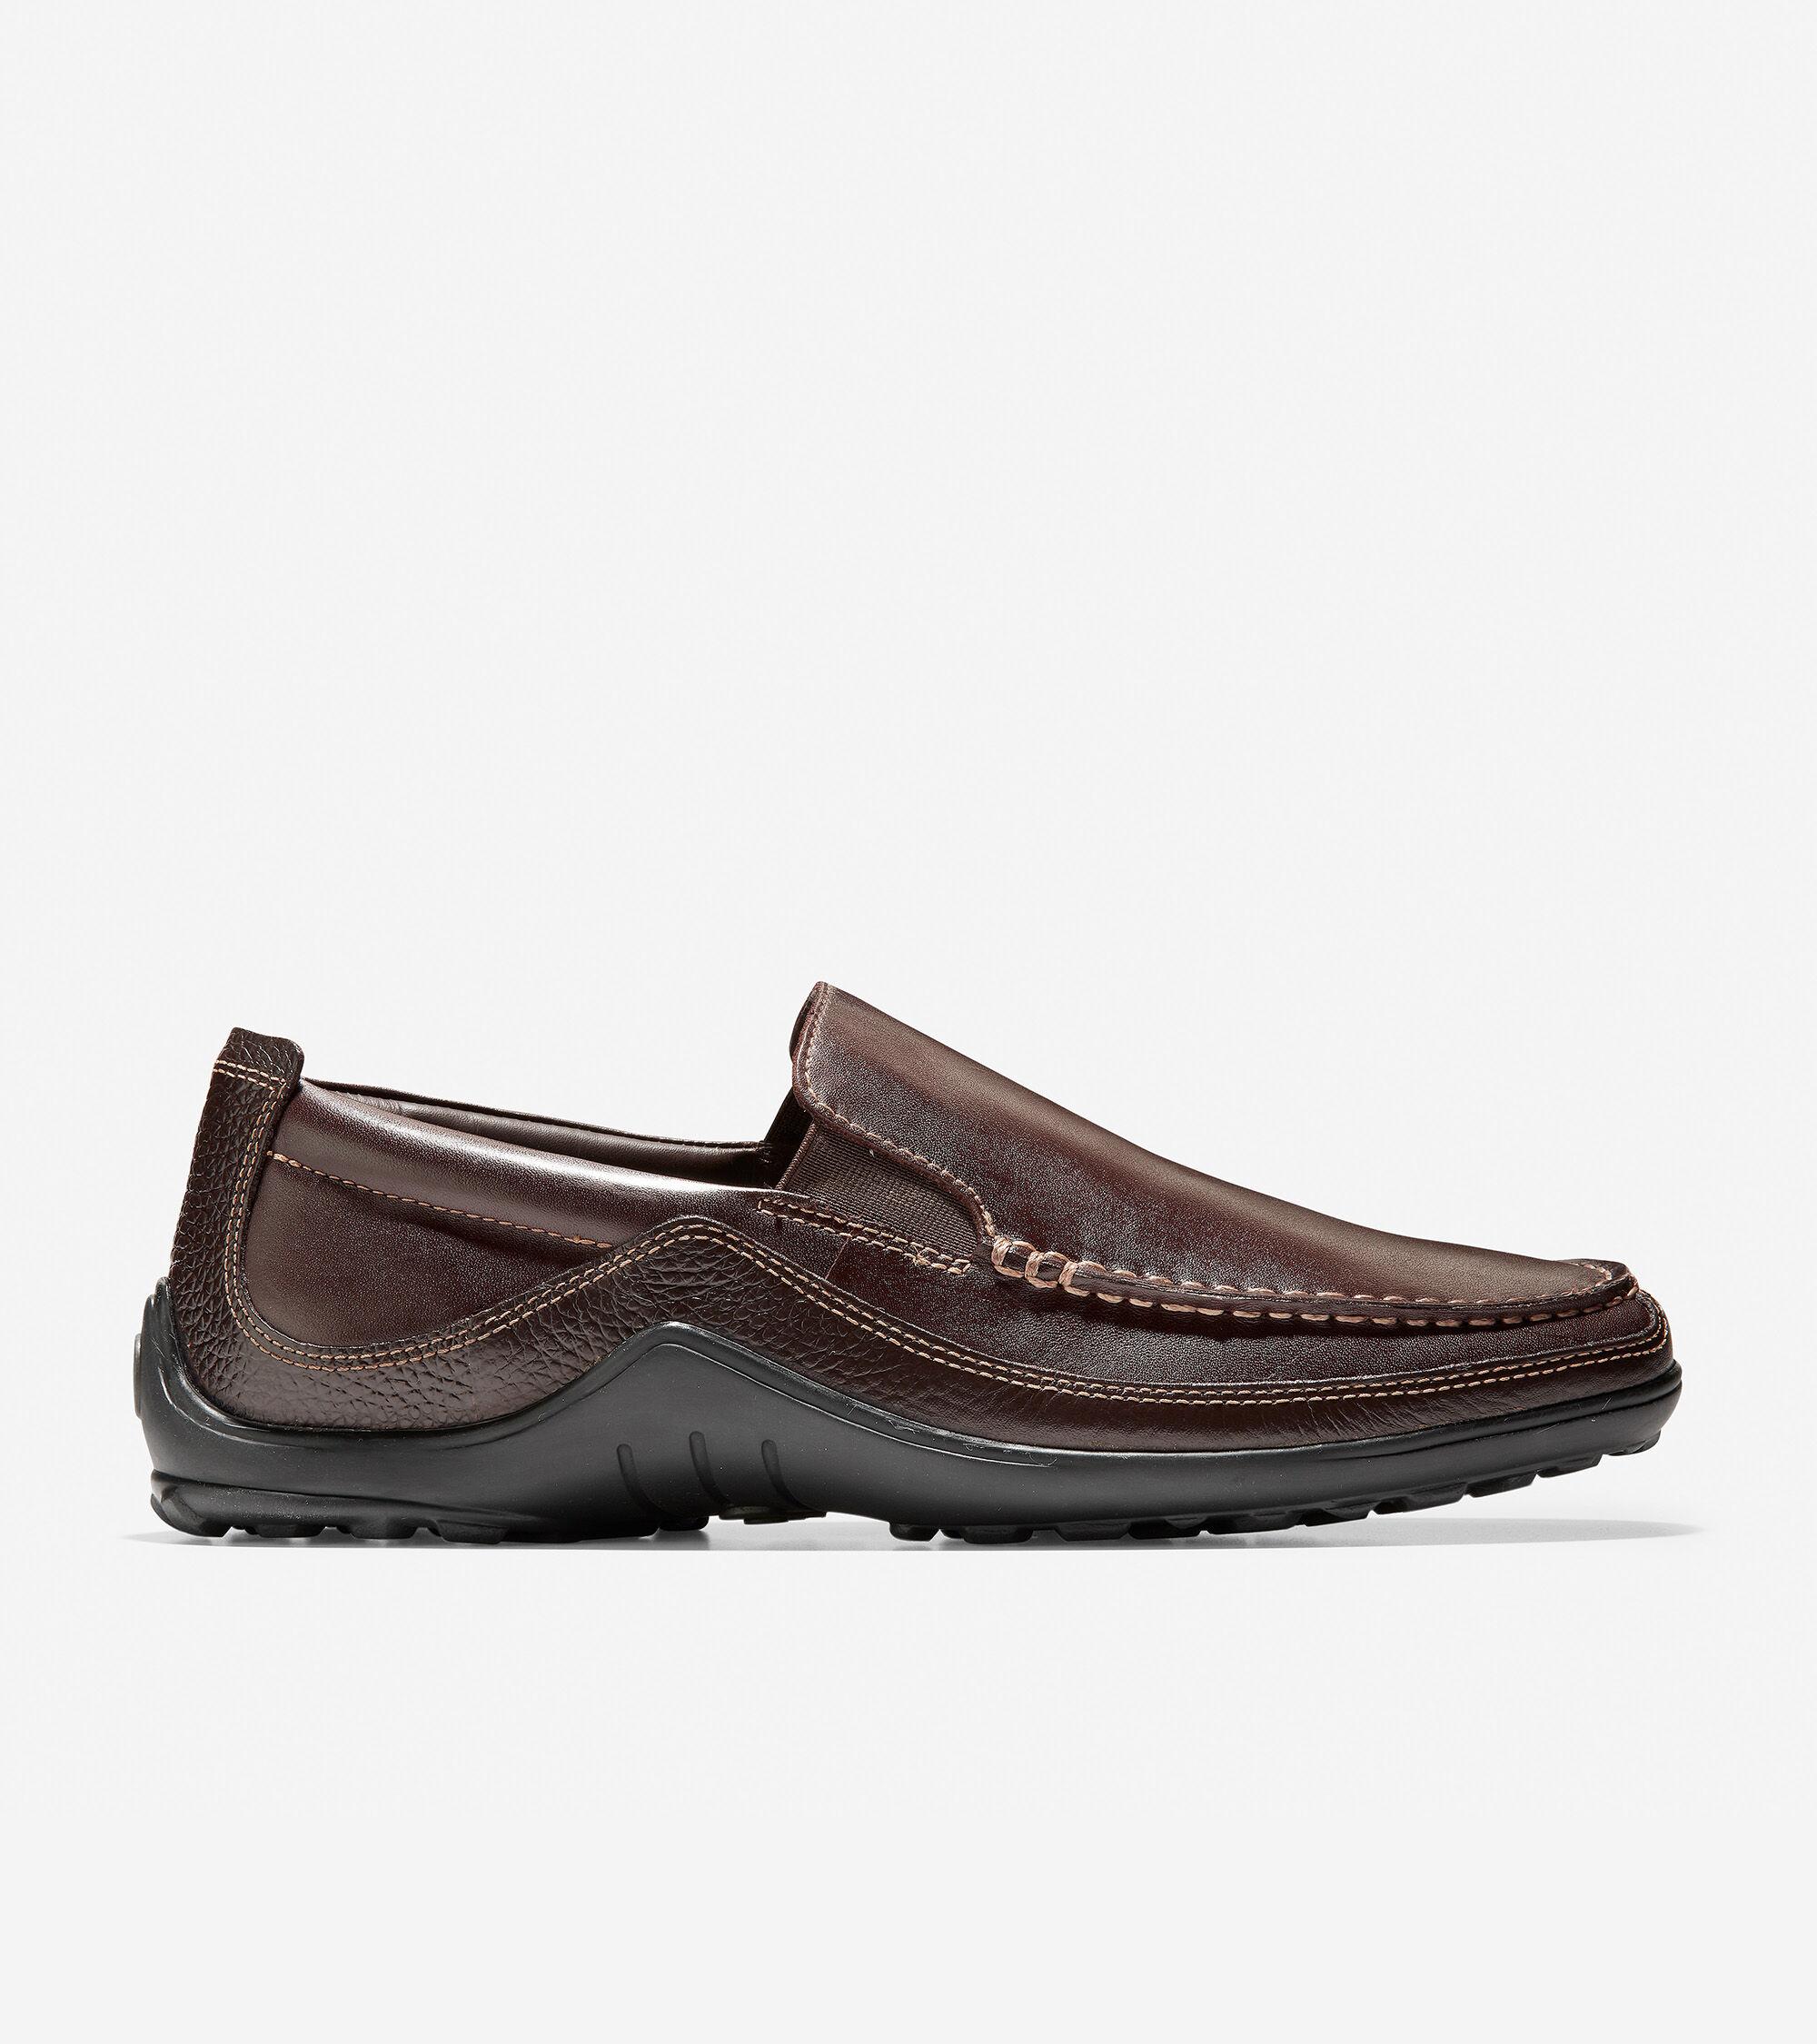 be9aedfdc0c Tucker Venetian Loafers in French Roast